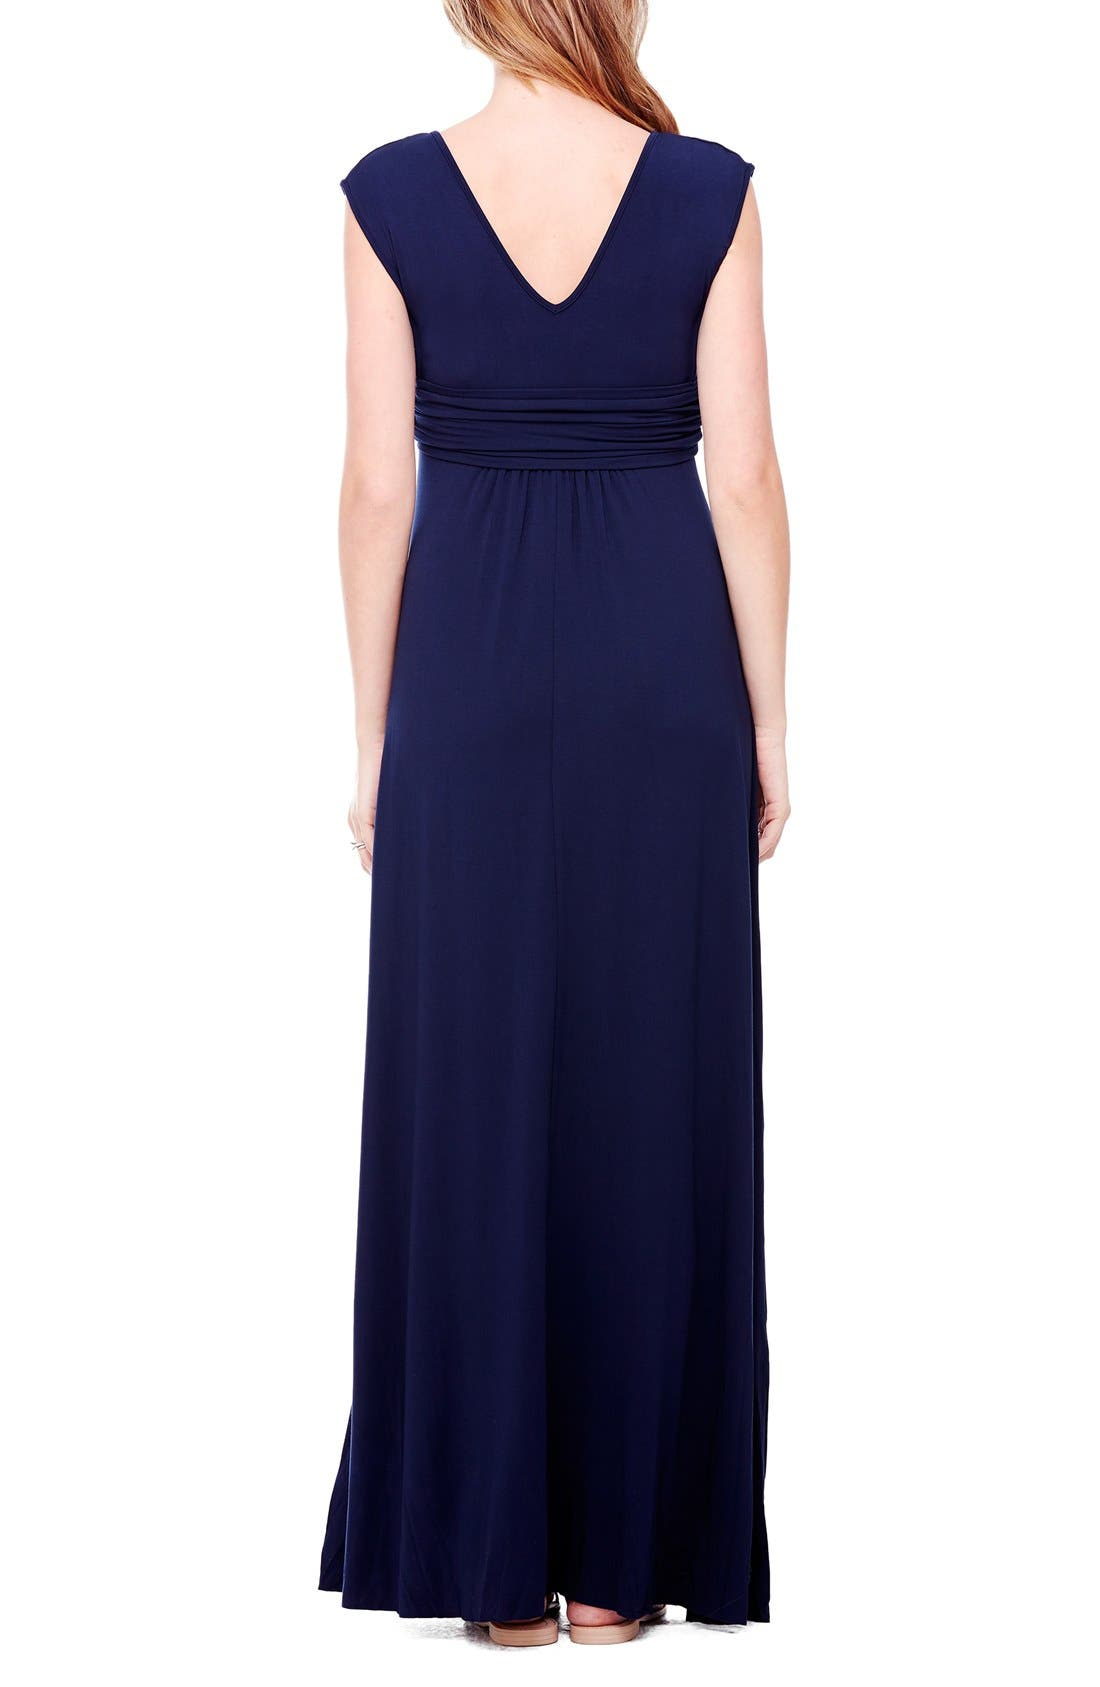 Empire Waist Maternity Maxi Dress,                             Alternate thumbnail 6, color,